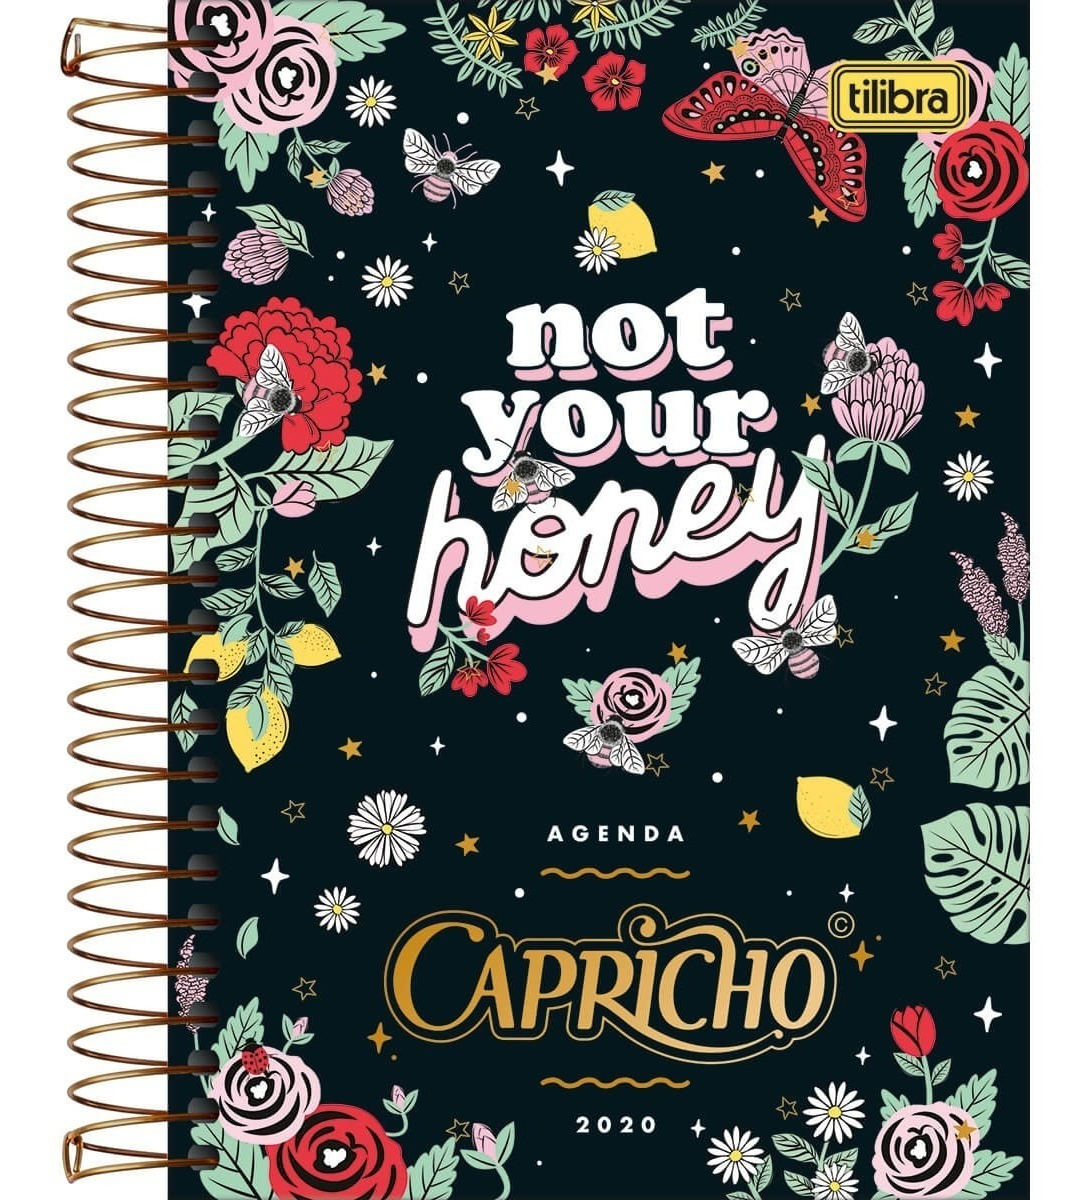 Agenda Capricho Espiral 2020 Capa 4 Not Your Honey Tilibra R 37